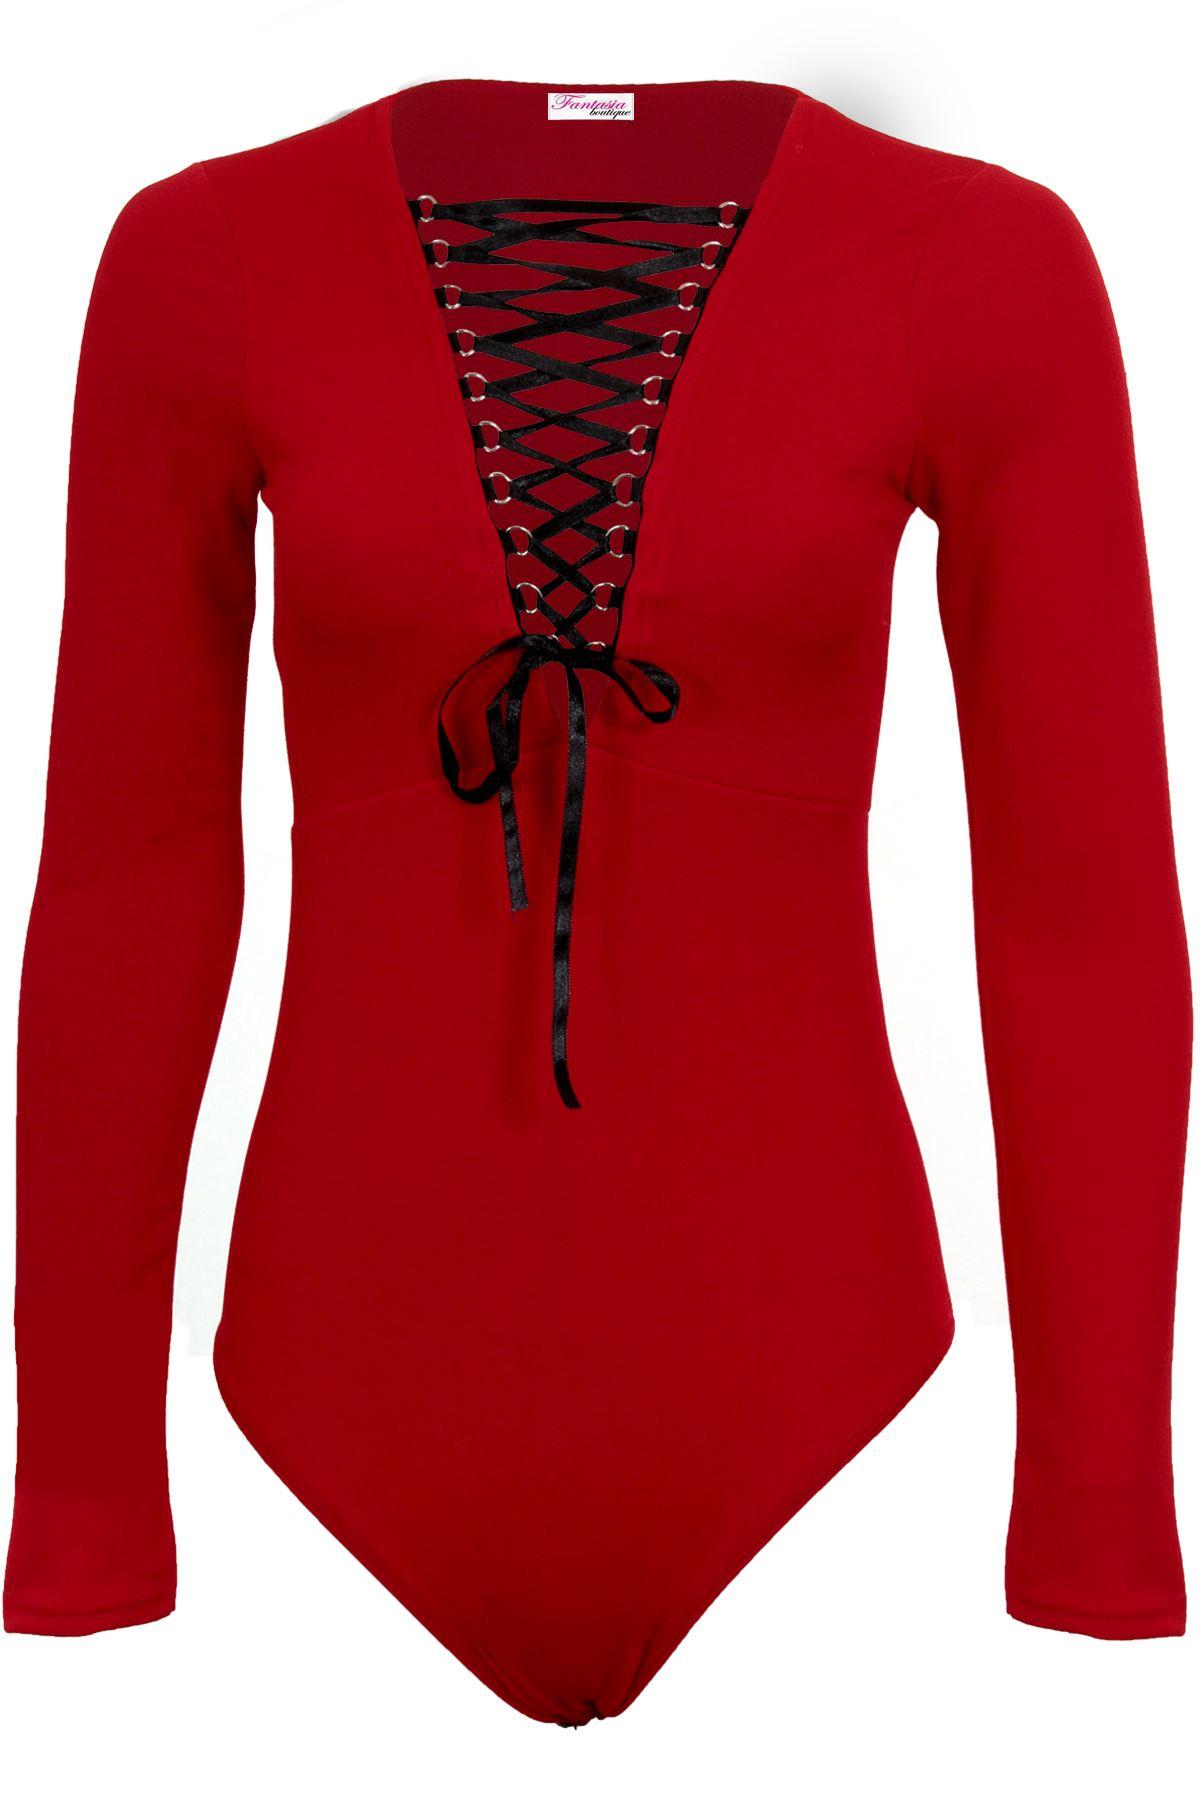 de56f5f6b8 Women s Adjustable Lace Up Front Long Sleeve Textured Plunge Leotard  Bodysuit